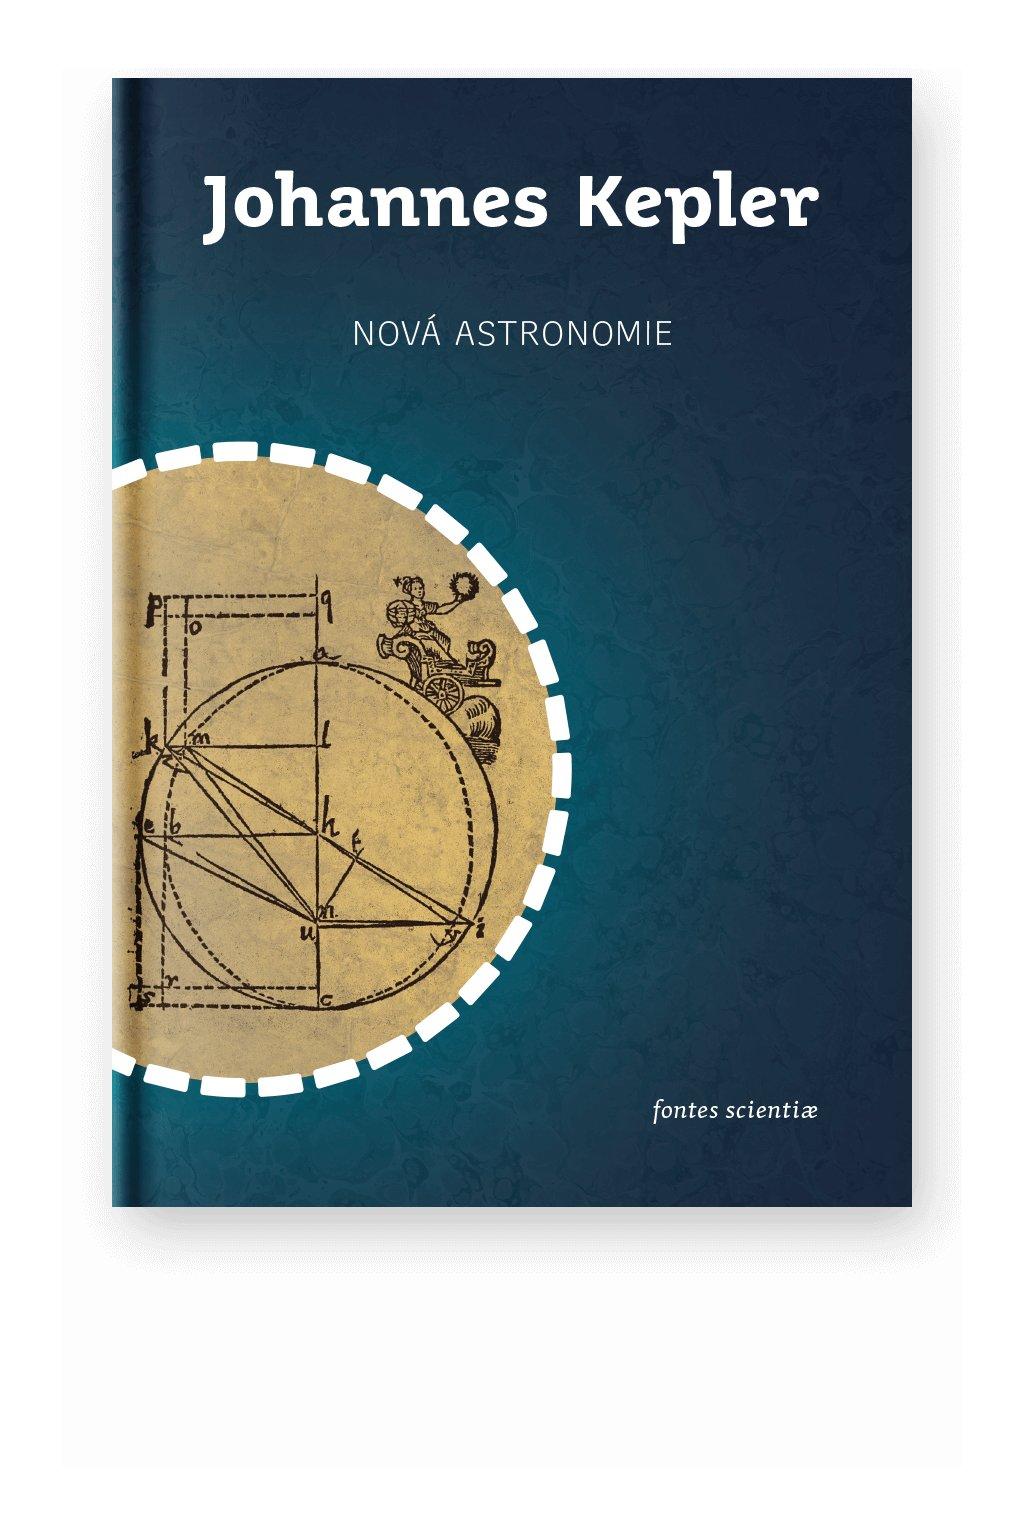 1400 nova astronomie